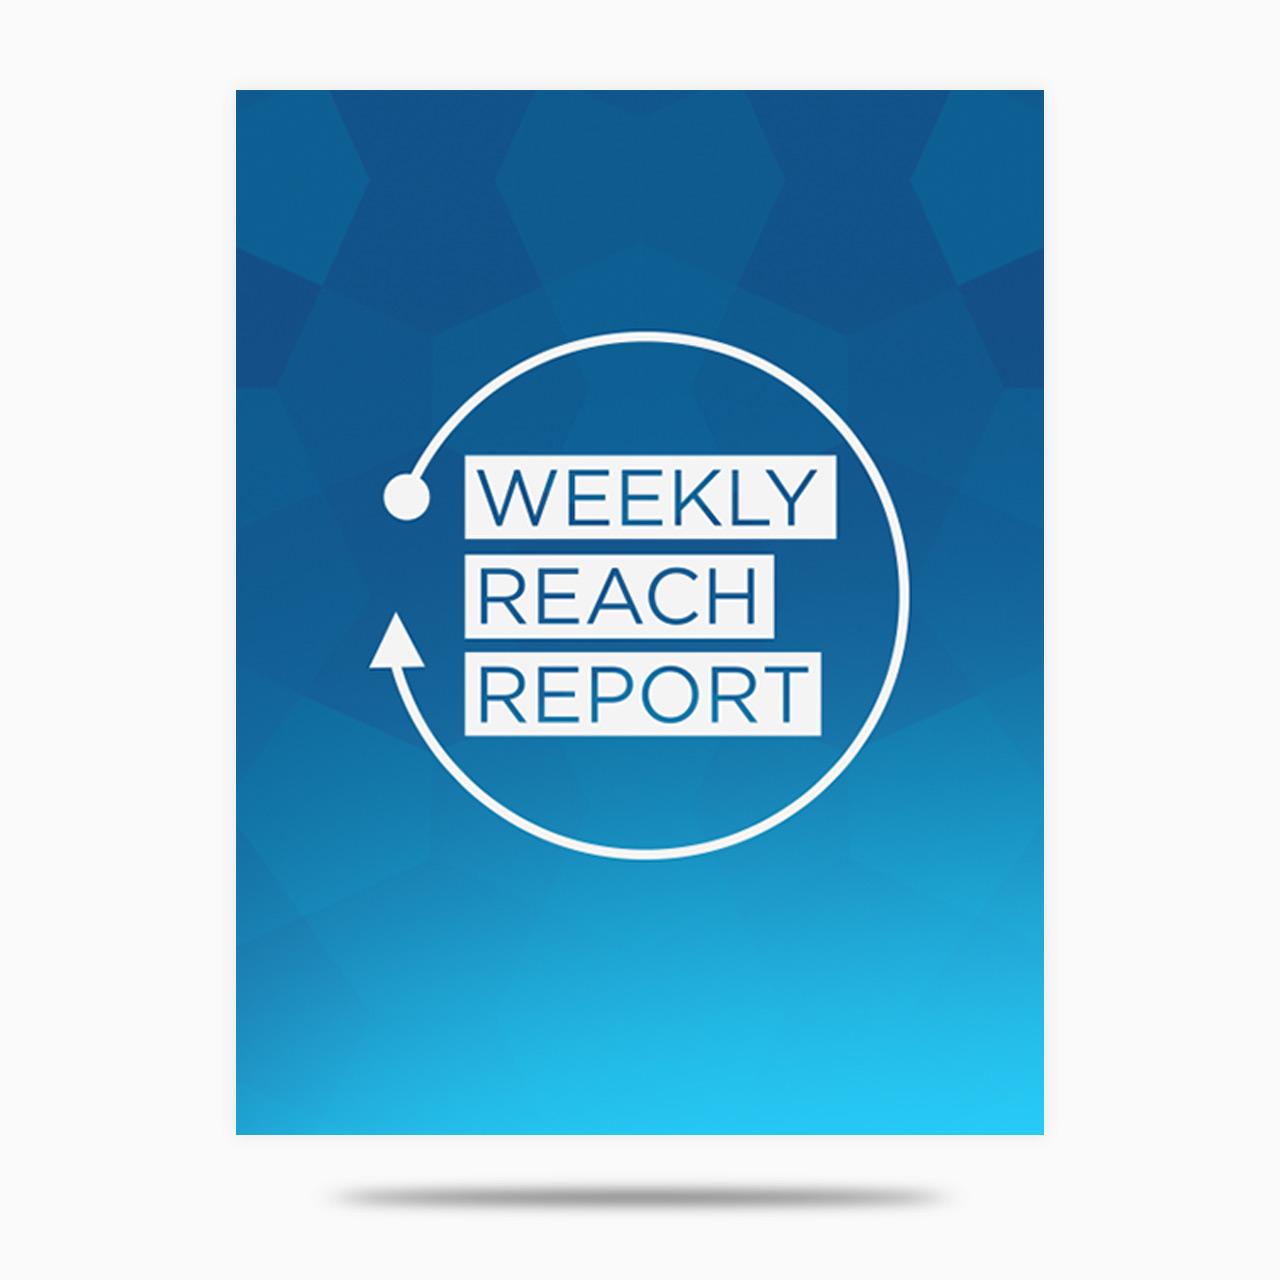 Weekly Reach Report